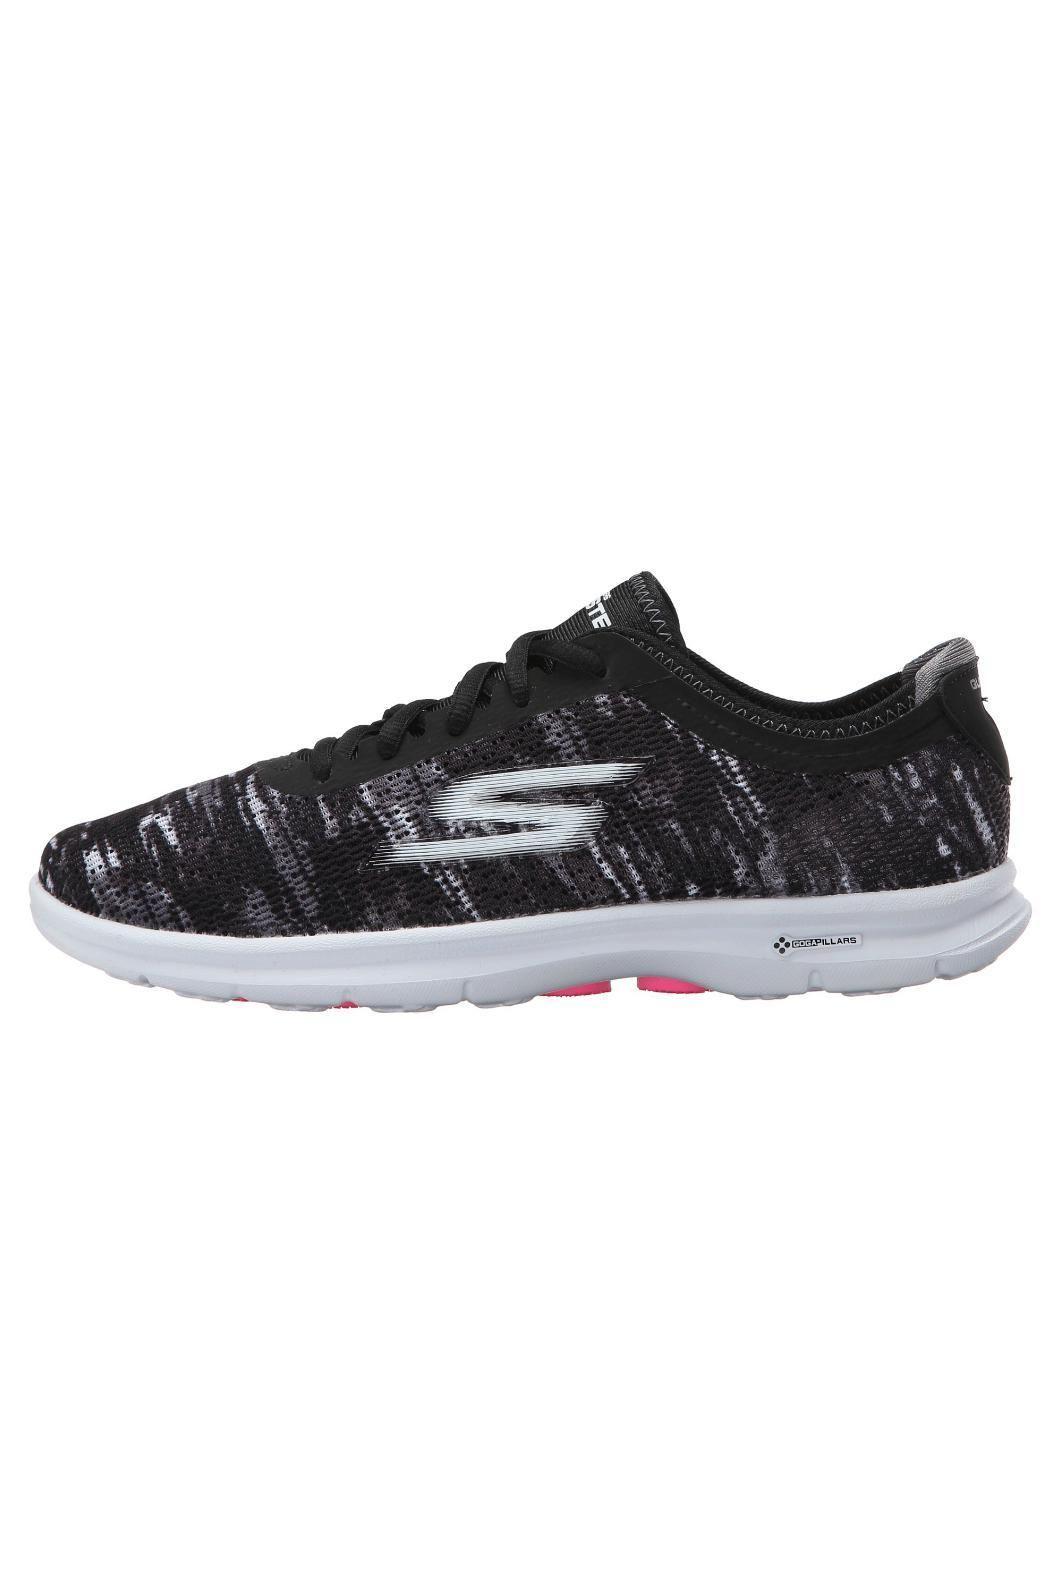 Sketchers Go Step Sneaker